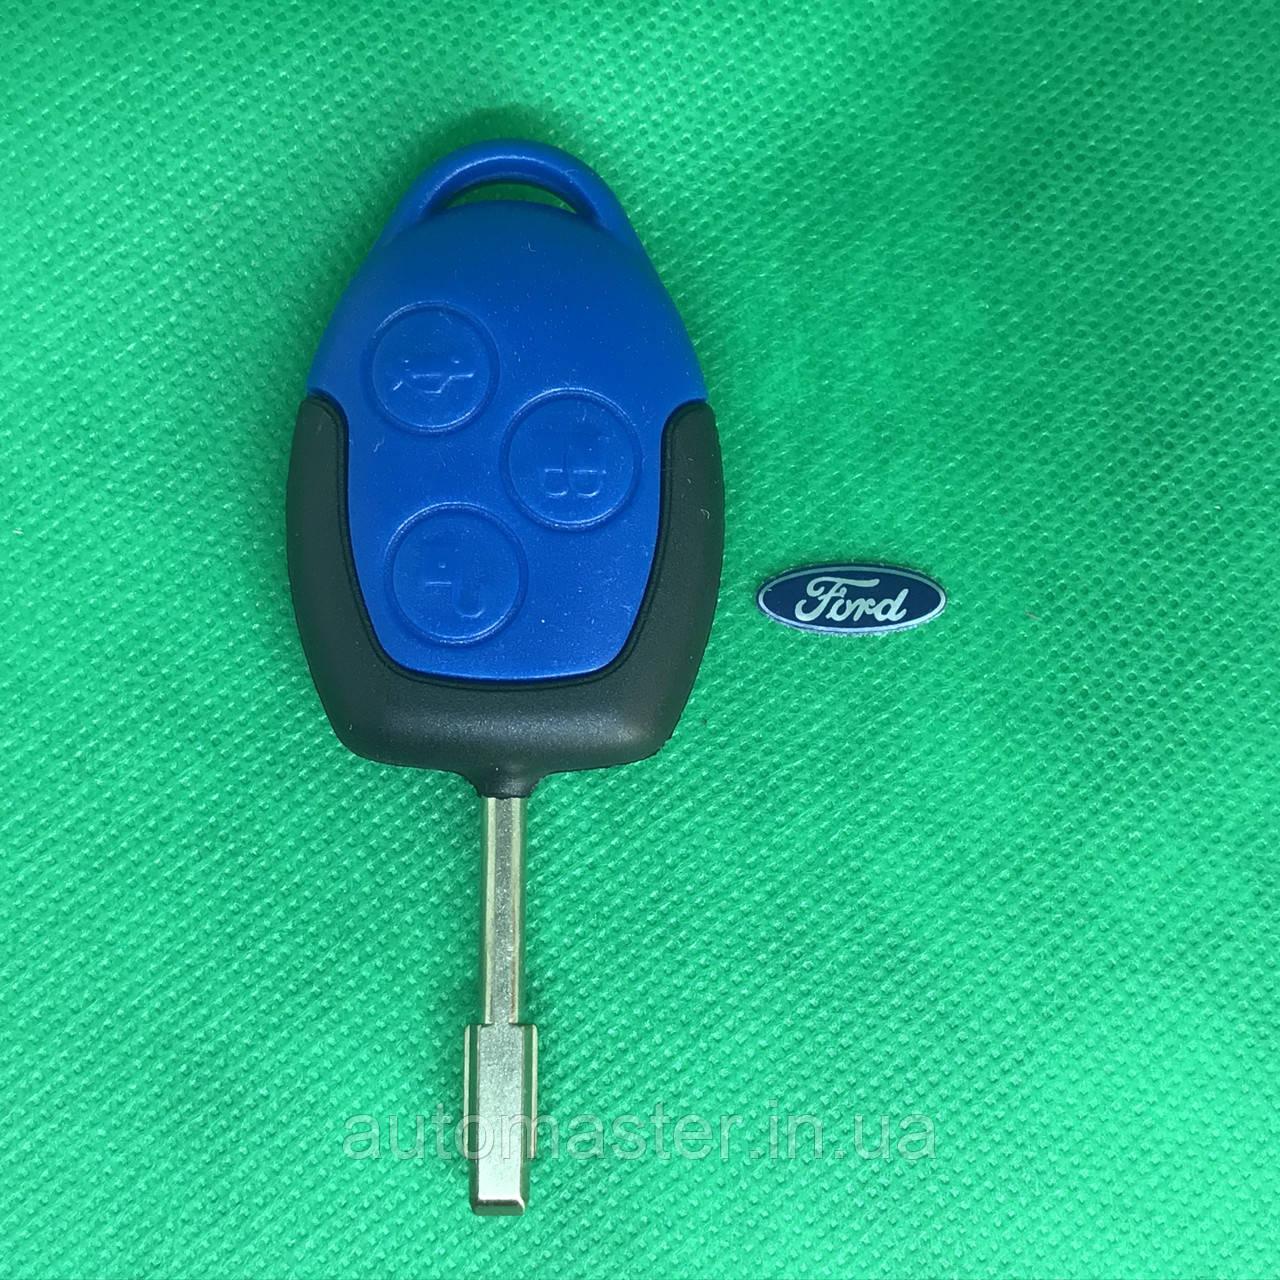 Корпус авто ключ для FORD Connect, Transit Форд Коннект, Транзит 3 - кнопки, лезвие FO21